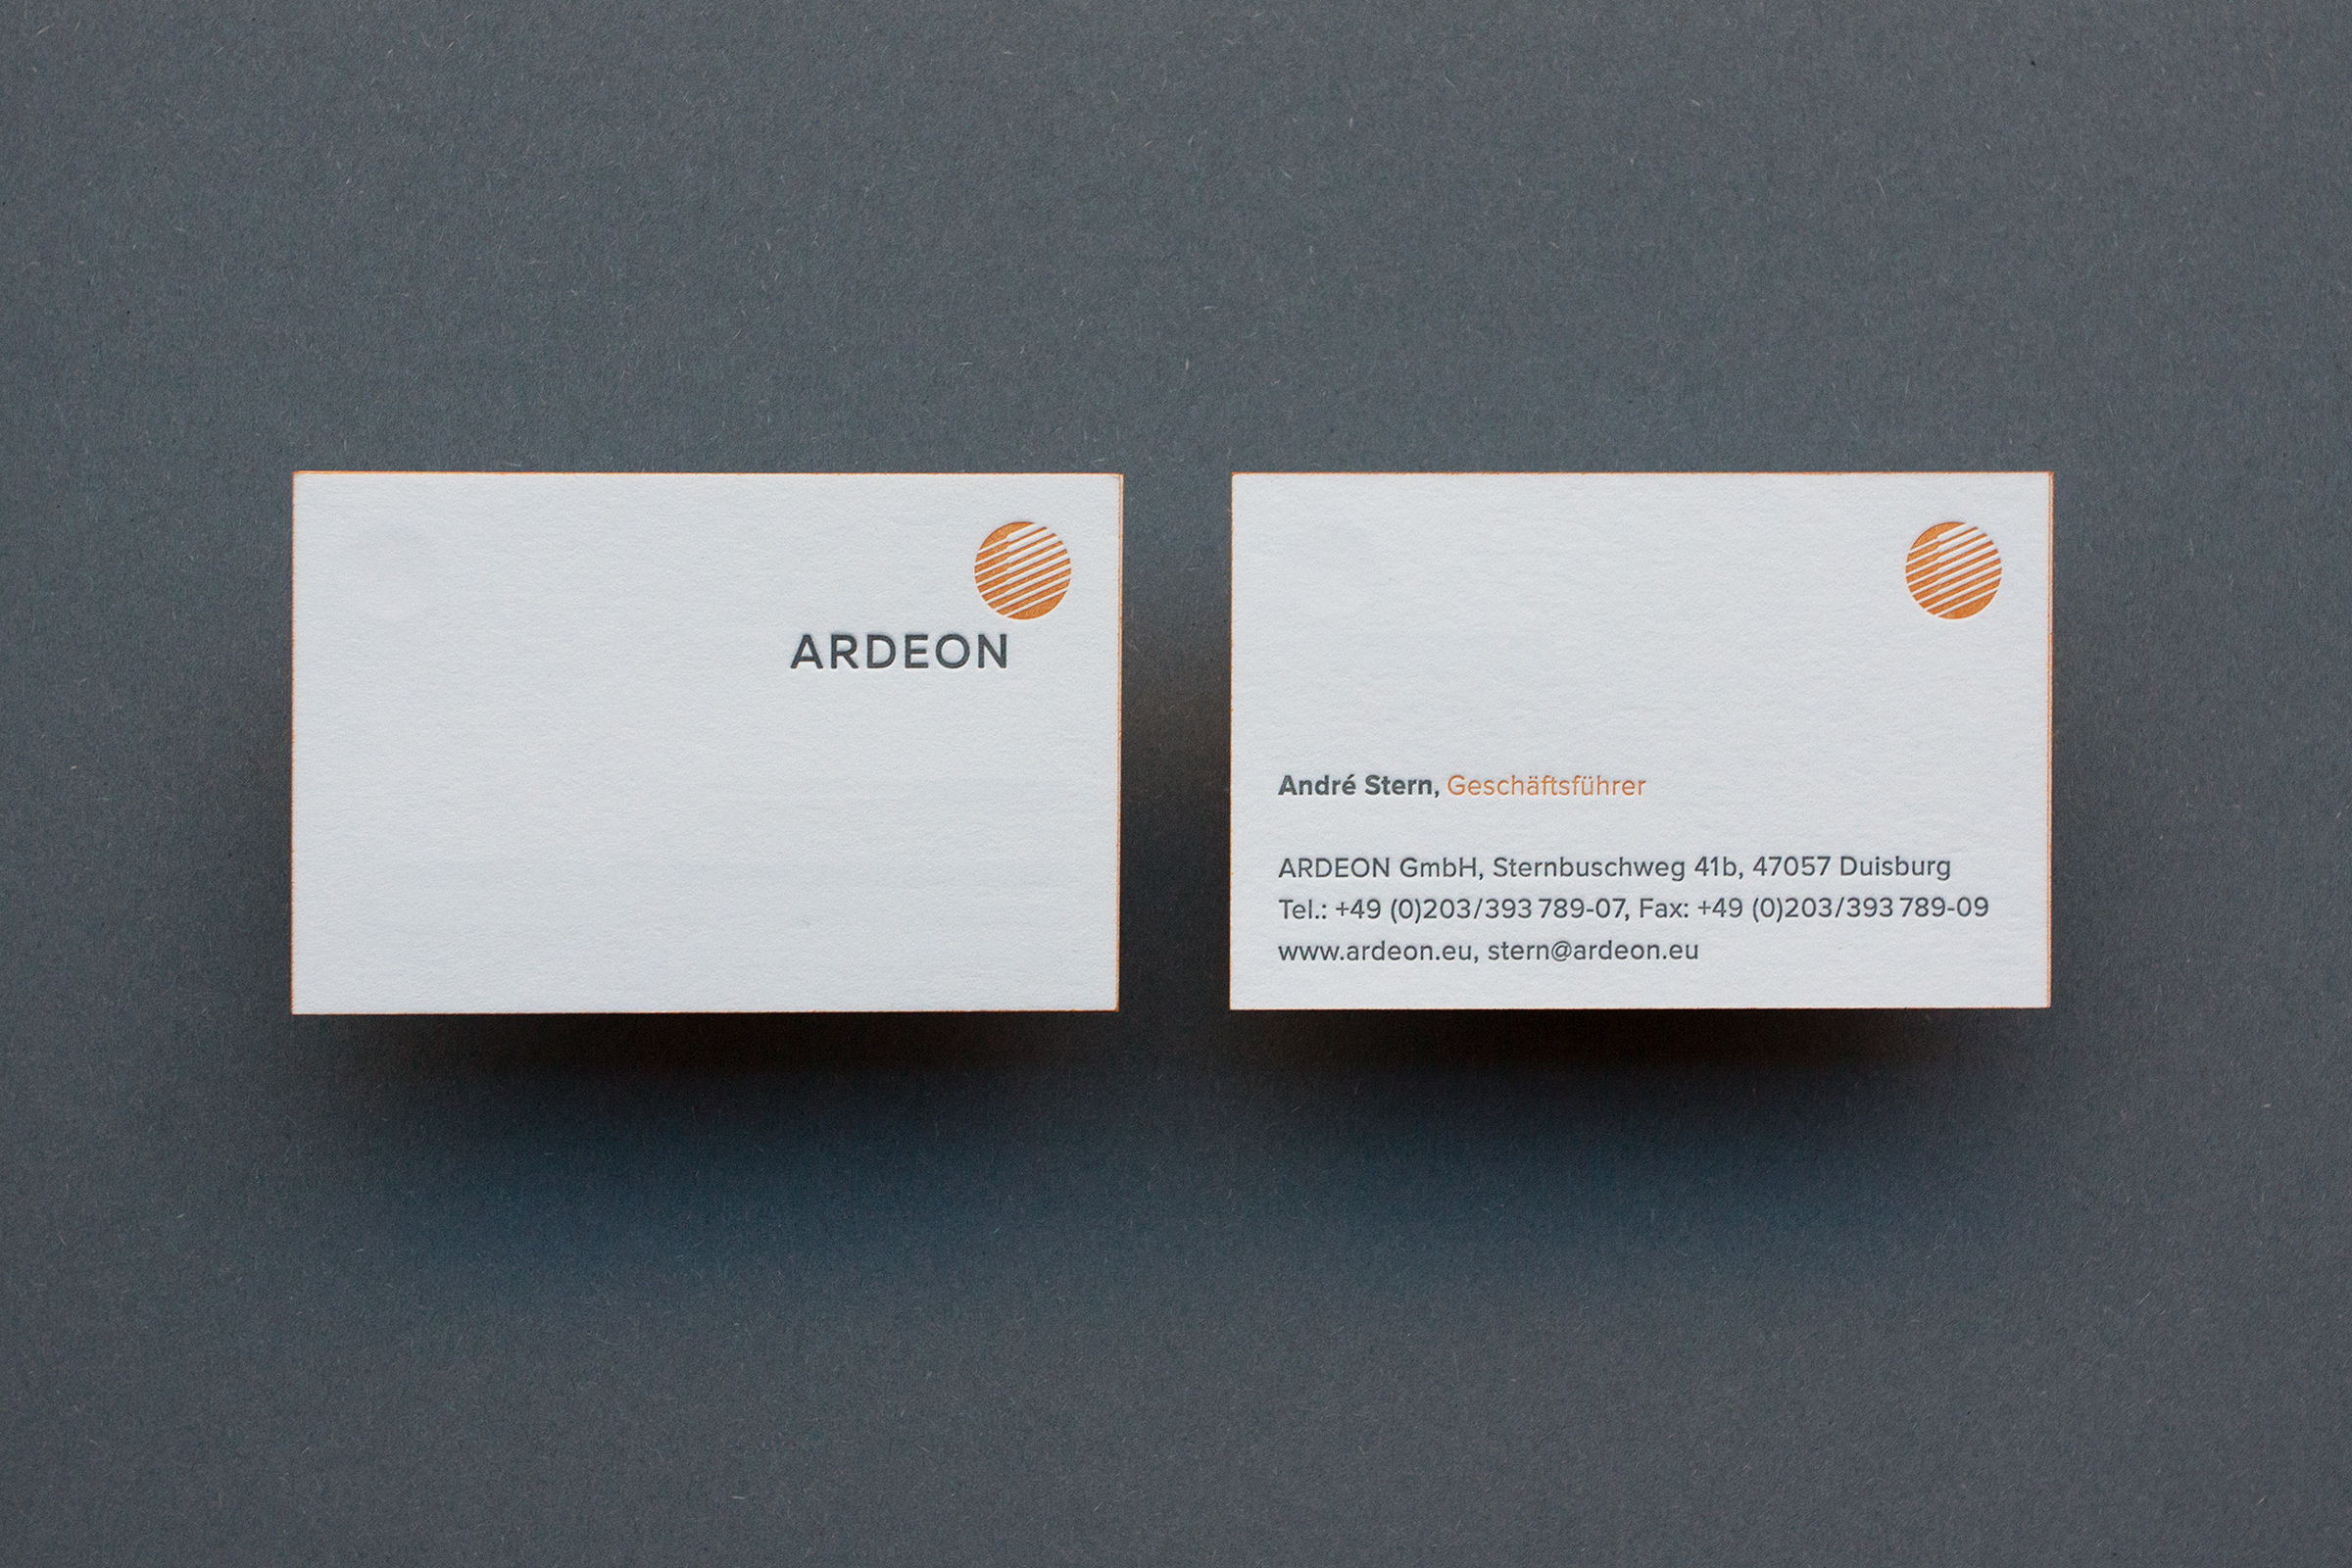 ardeon-bueroink-logo_2958